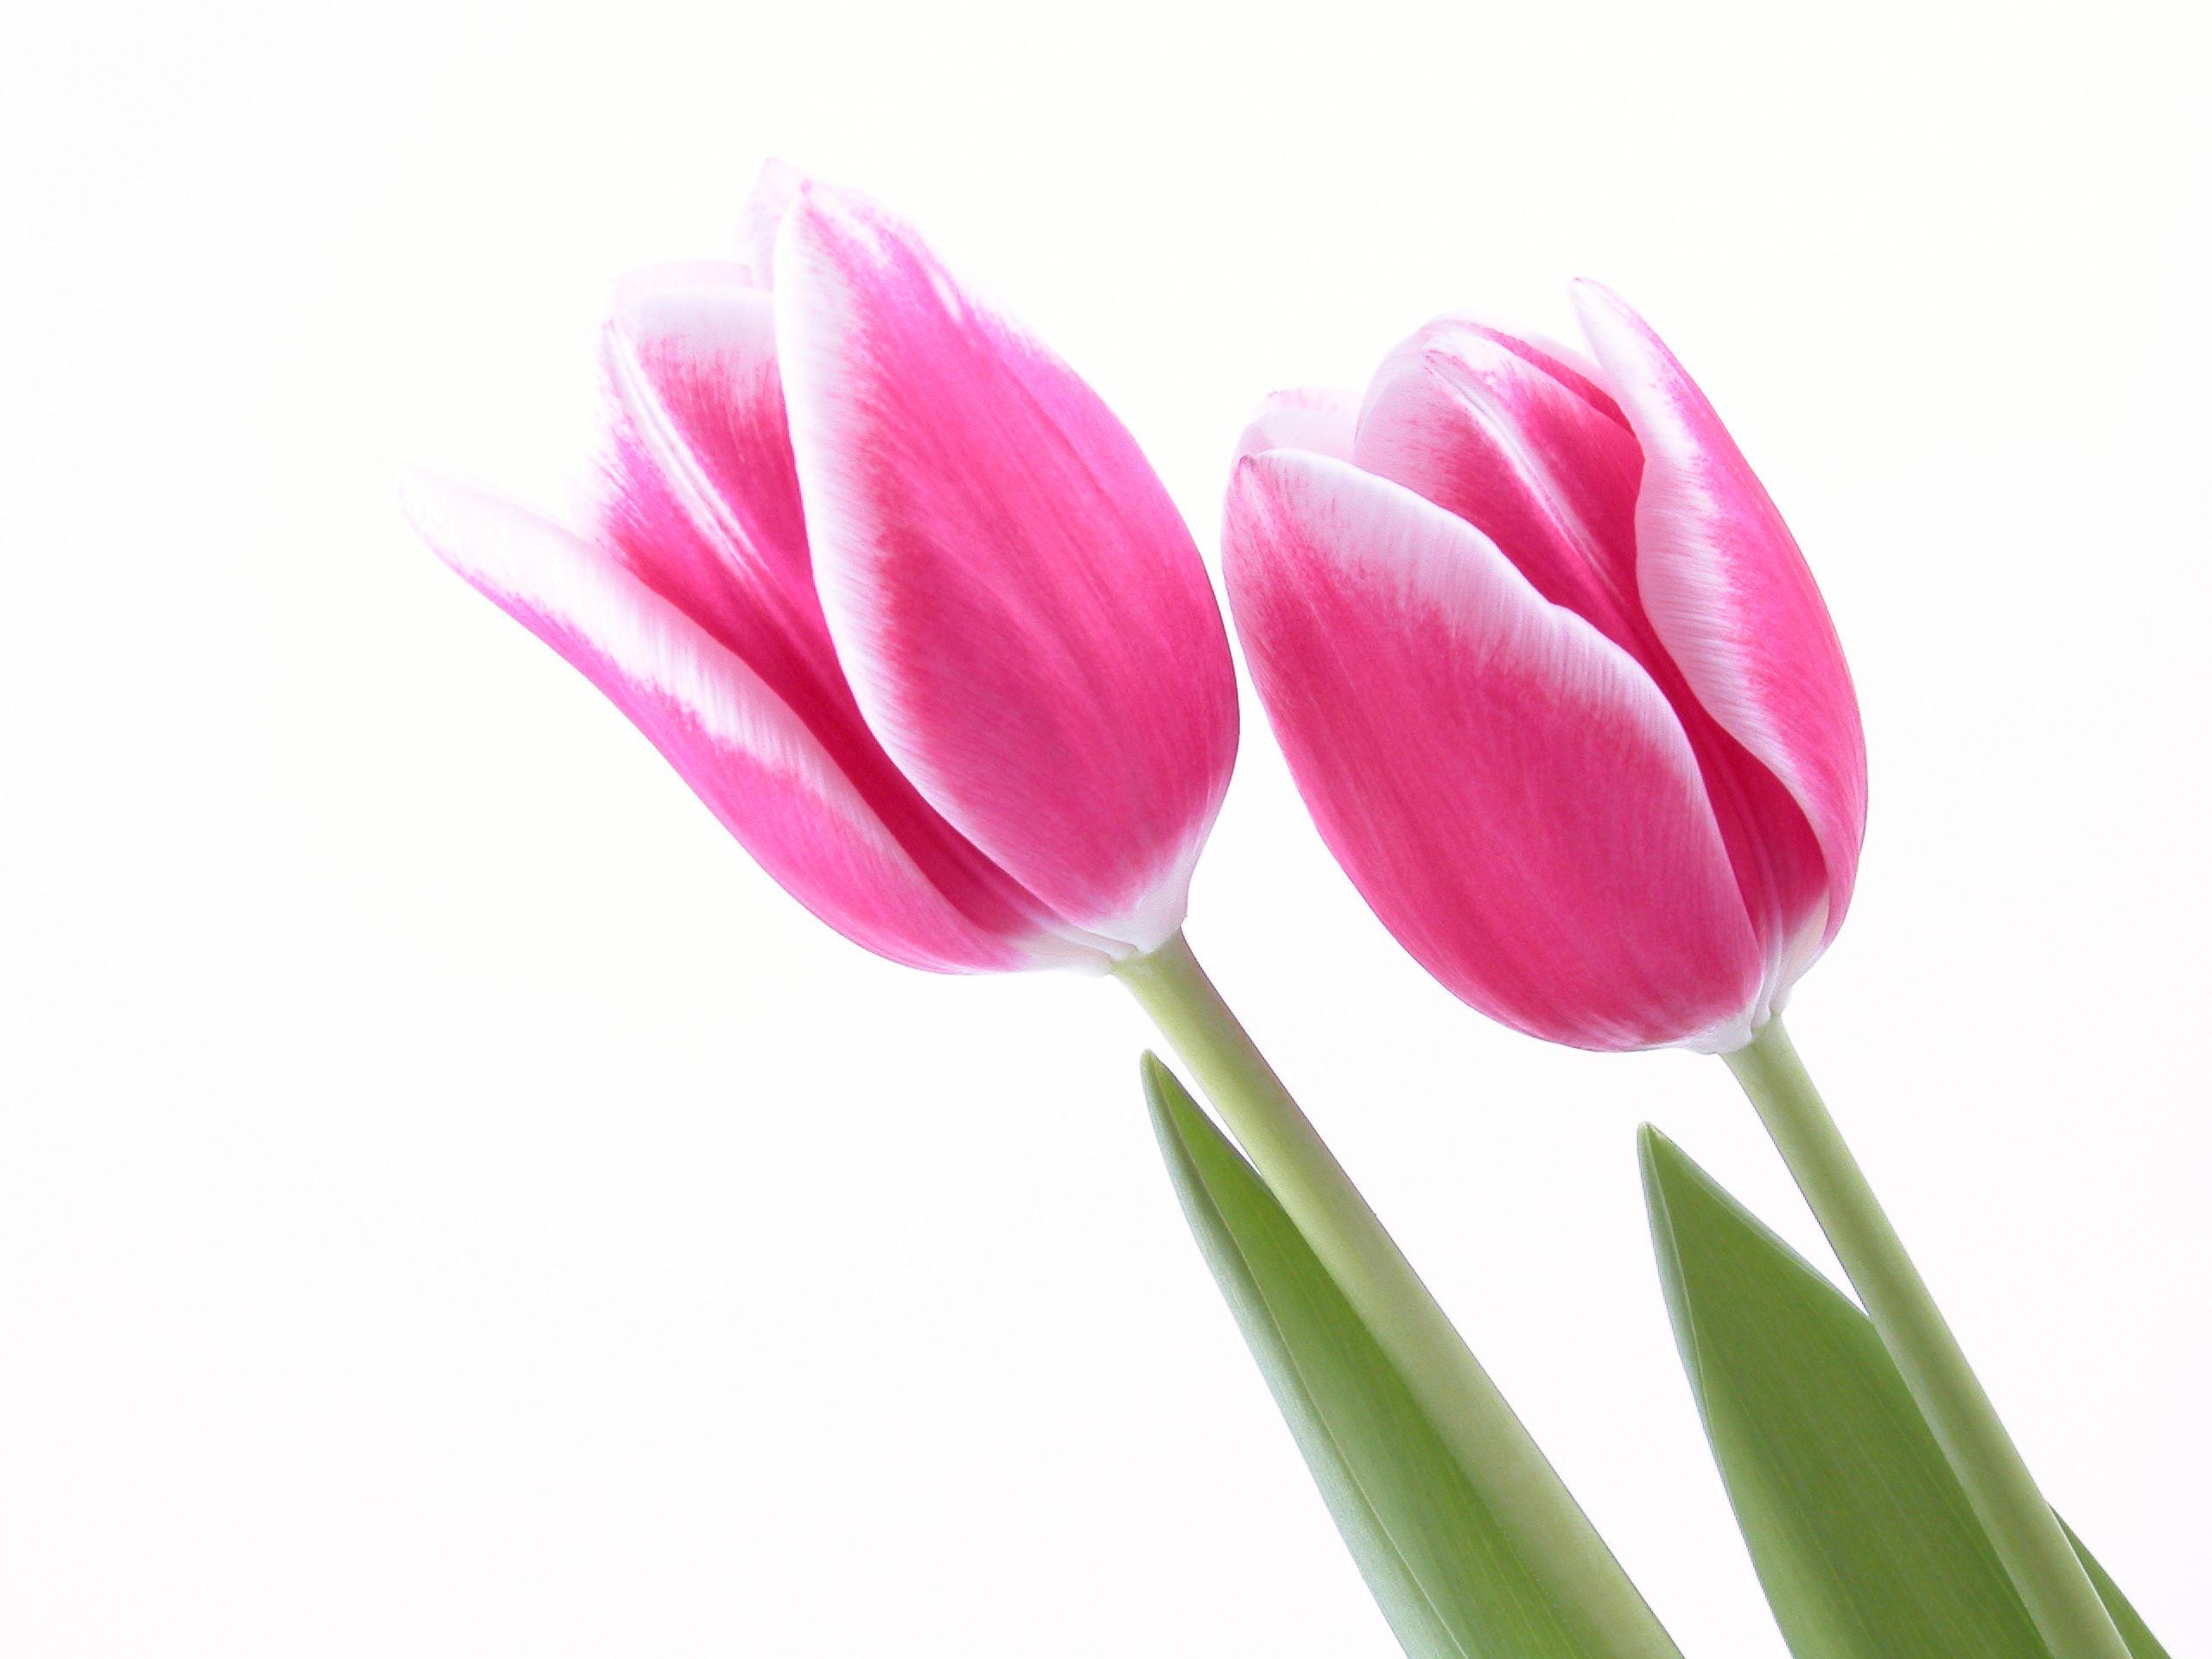 pink tulips 20 cool wallpaper